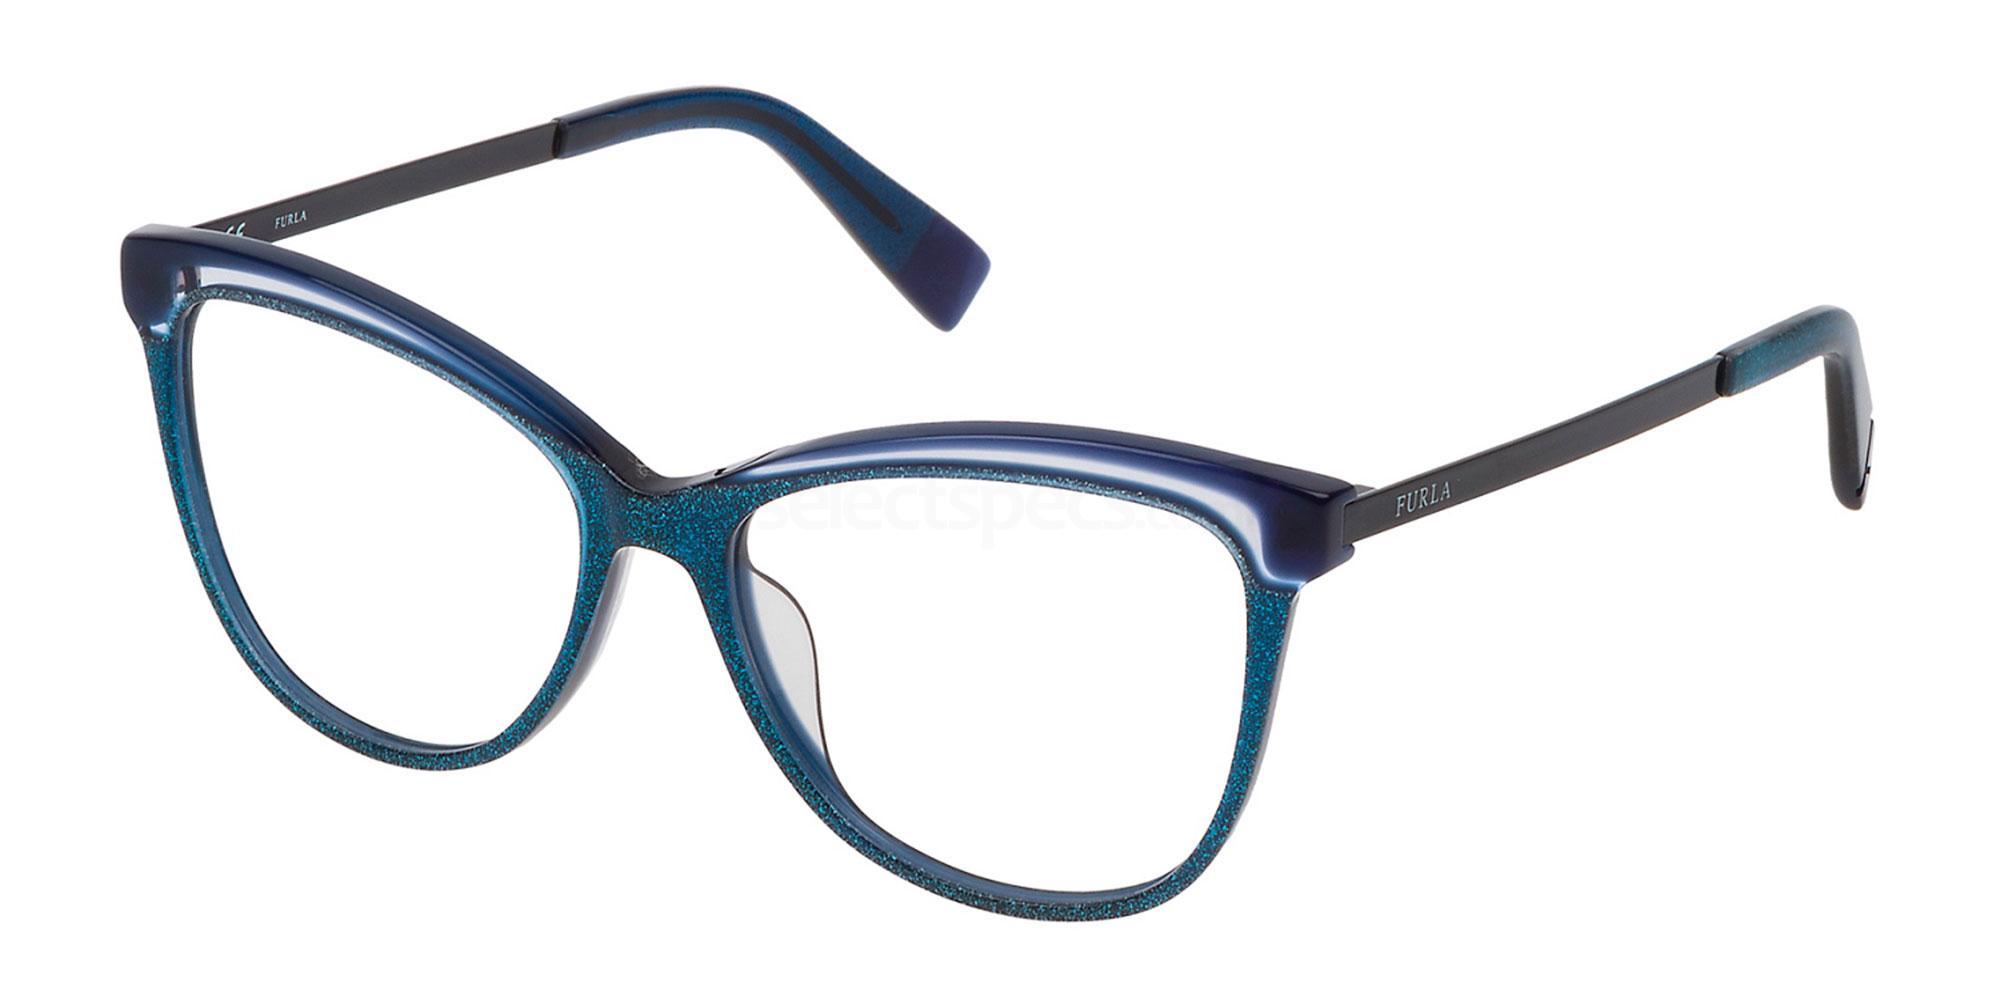 0WA2 VFU192 Glasses, Furla